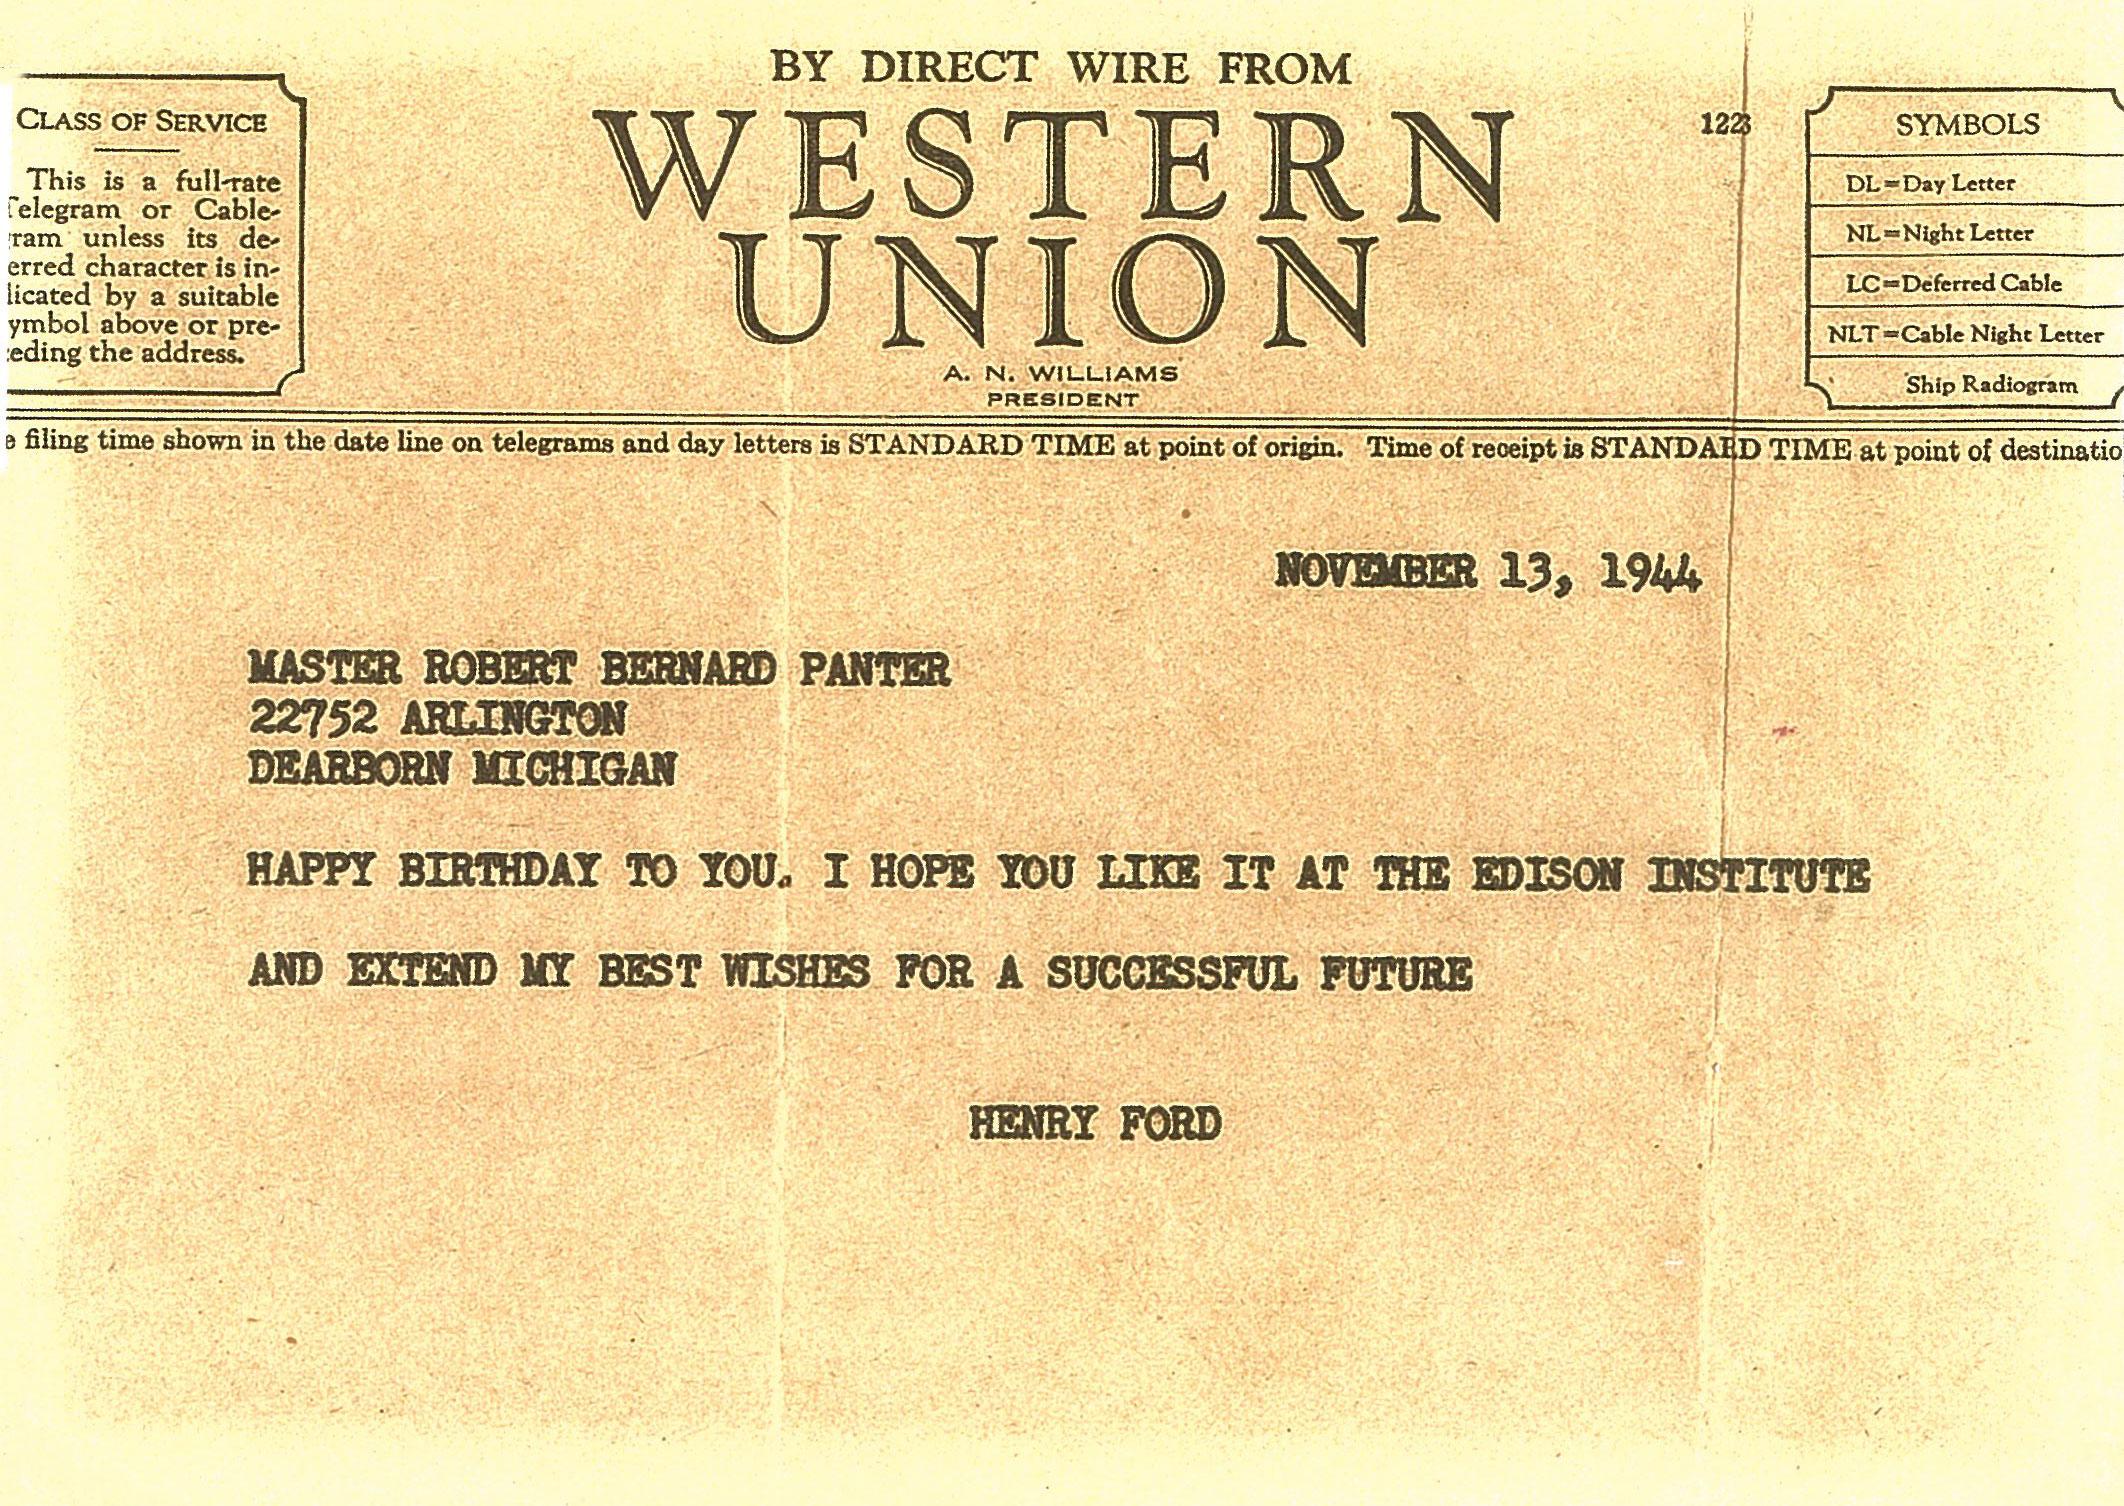 Birthday telegram to Bob Panter from Henry Ford